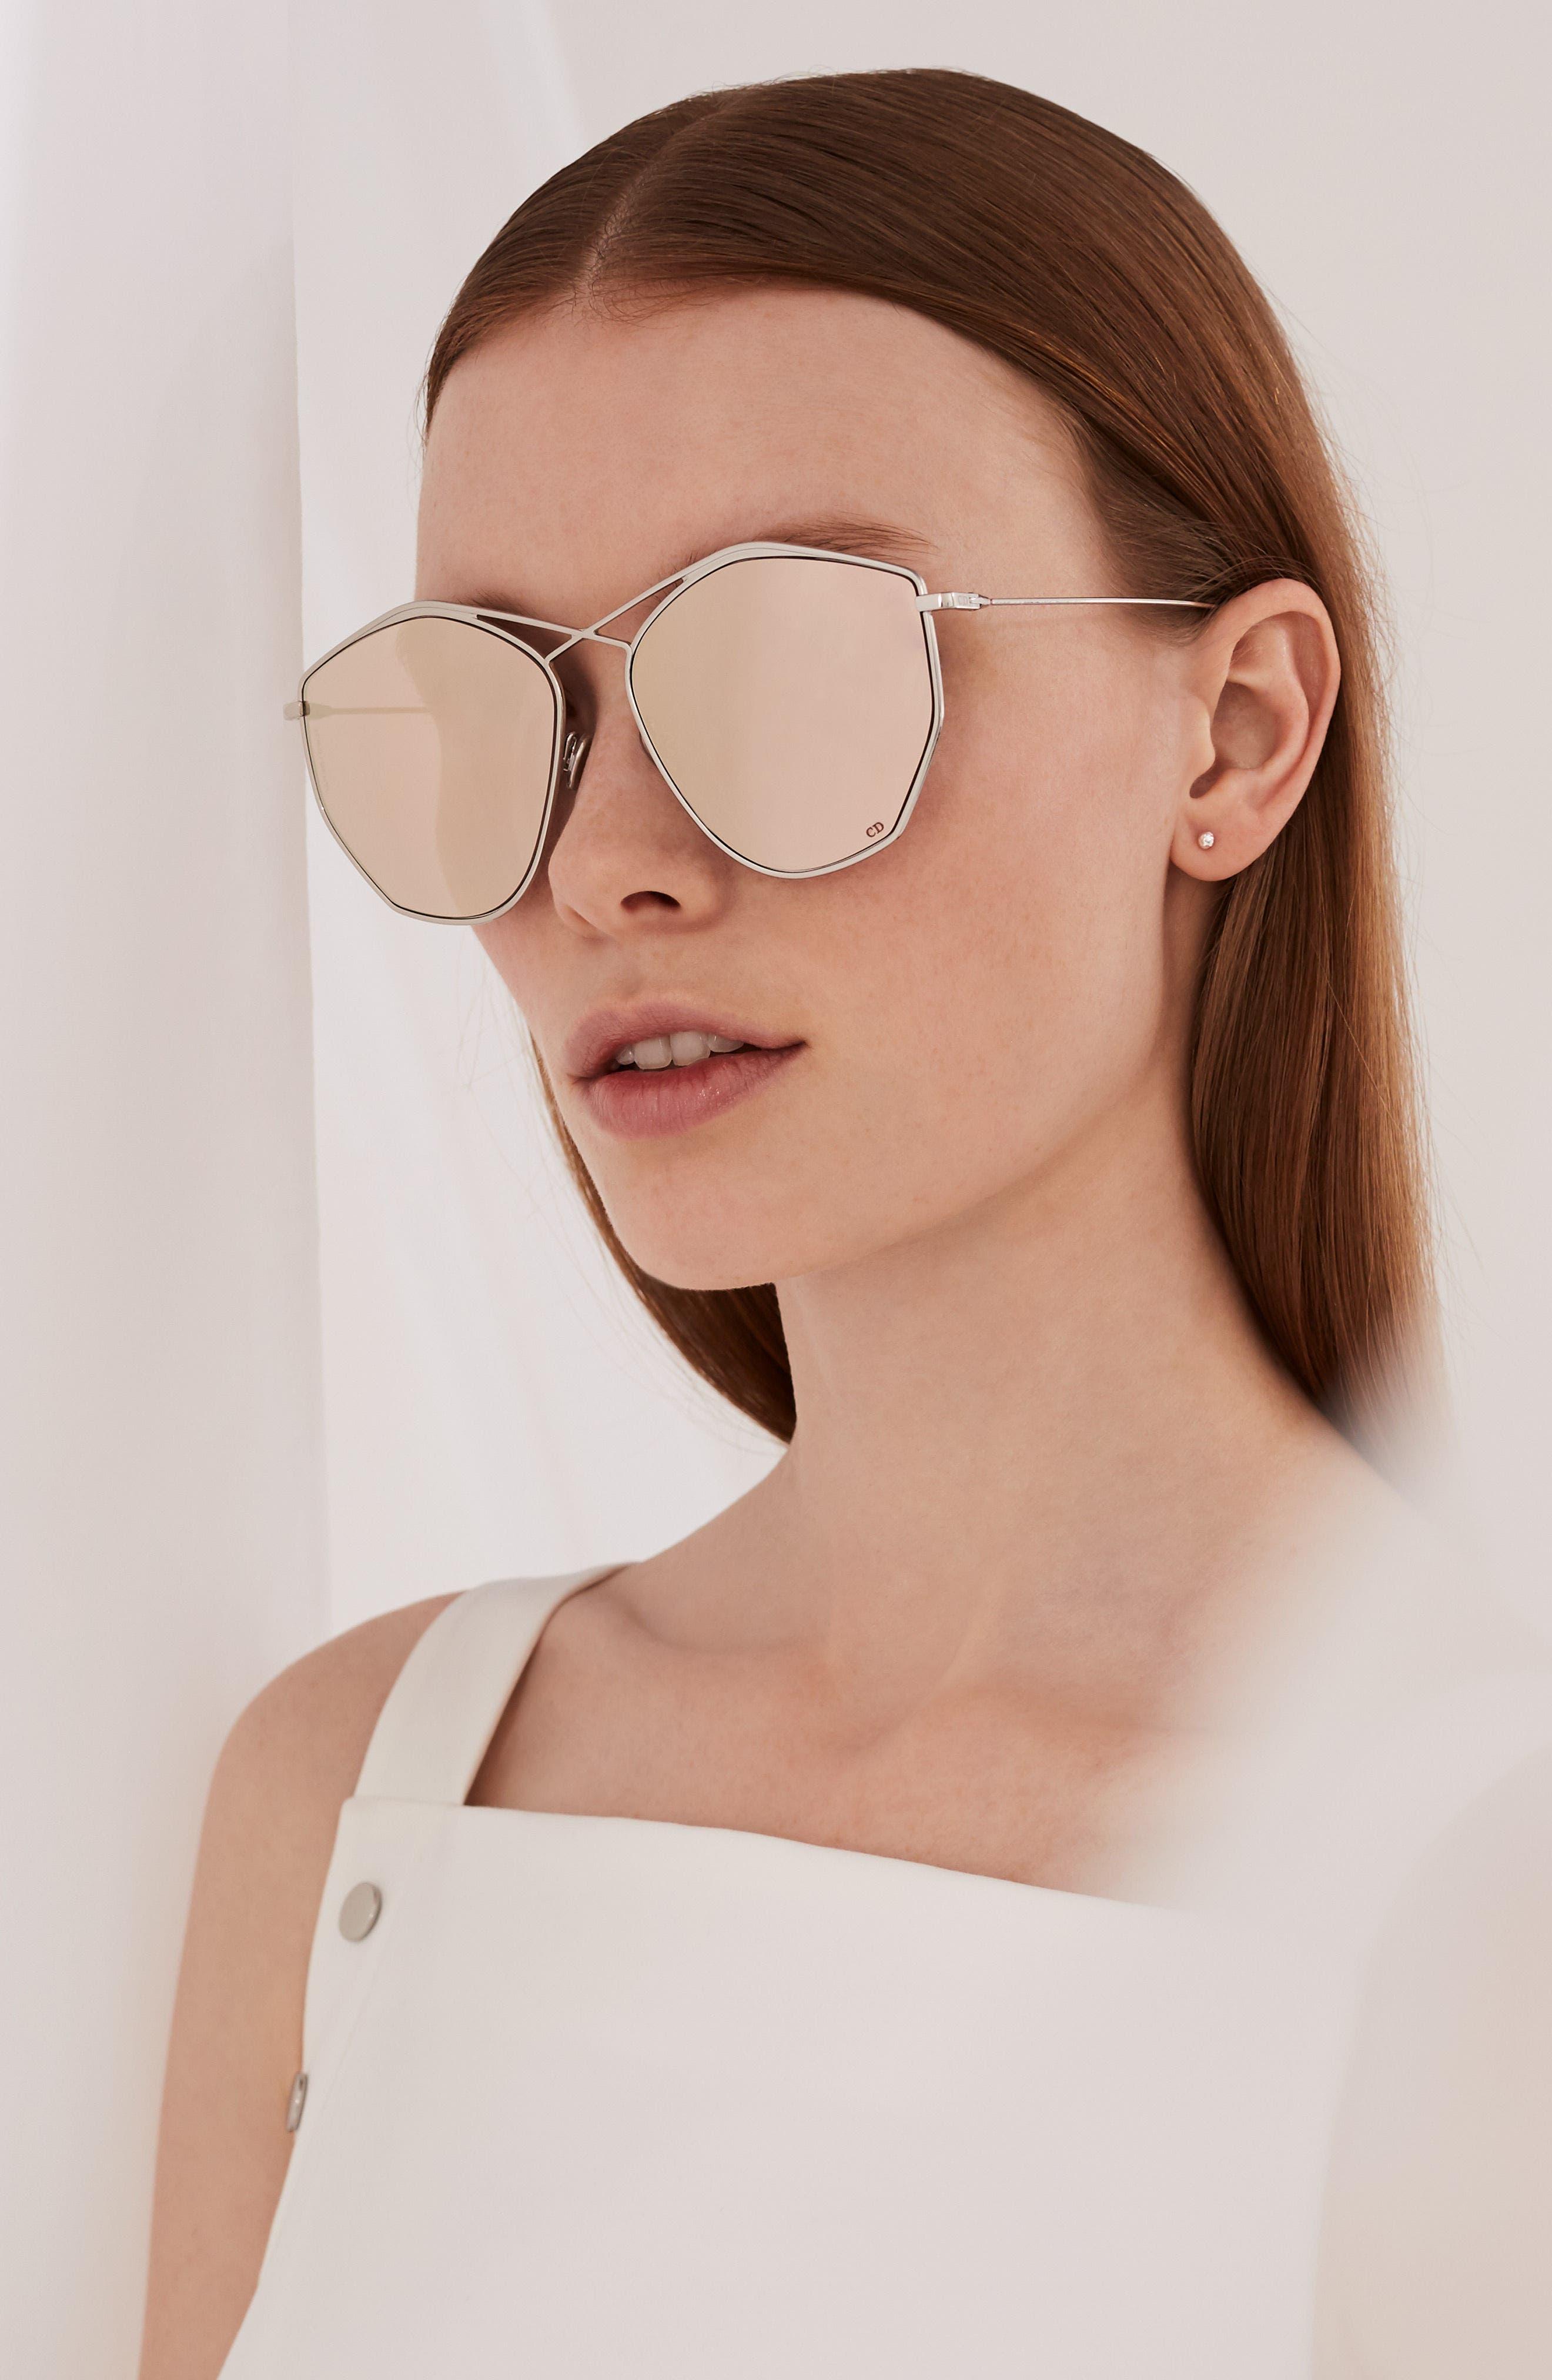 59mm Metal Sunglasses,                             Alternate thumbnail 4, color,                             LIGHT GOLD